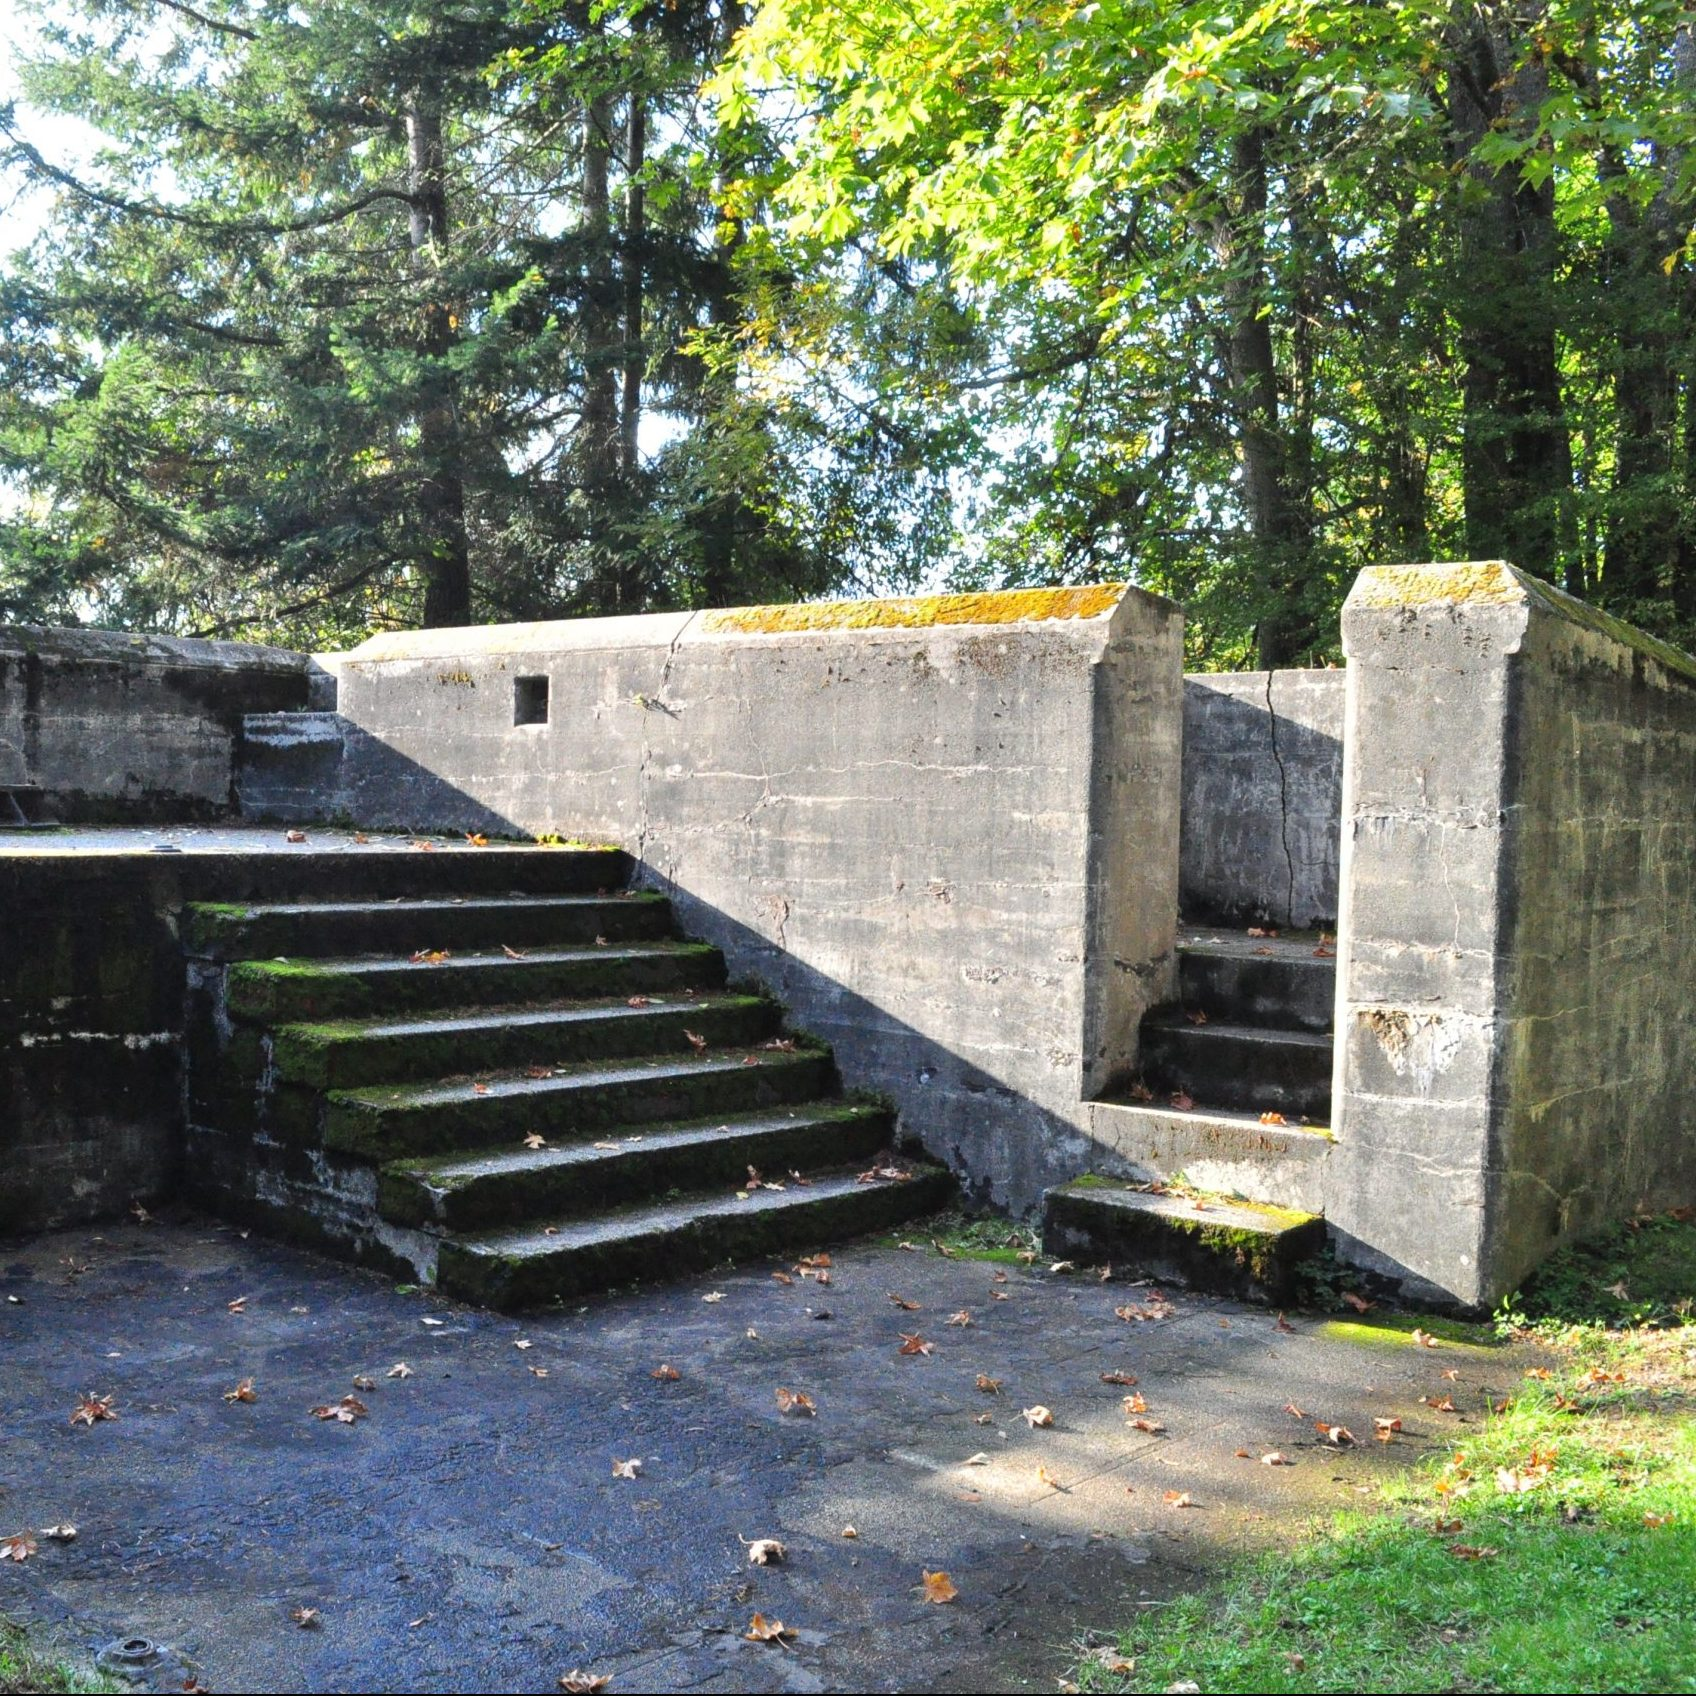 Bainbridge Island History and Historic Attractions